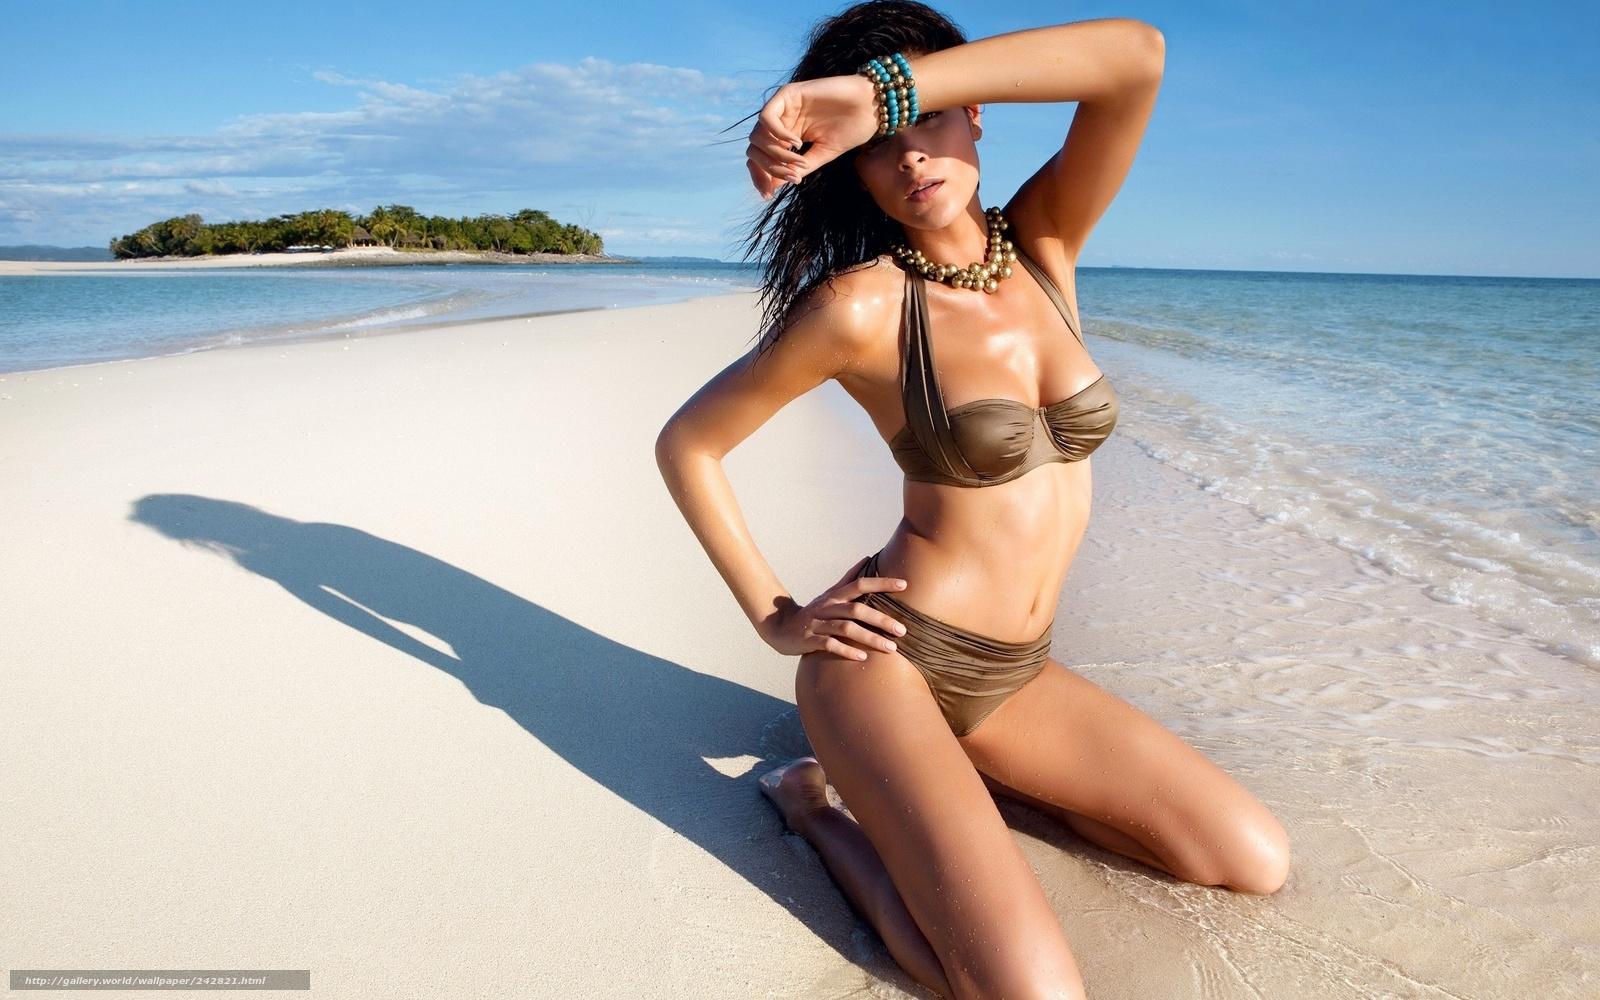 Фото девчонки на пляже 8 фотография